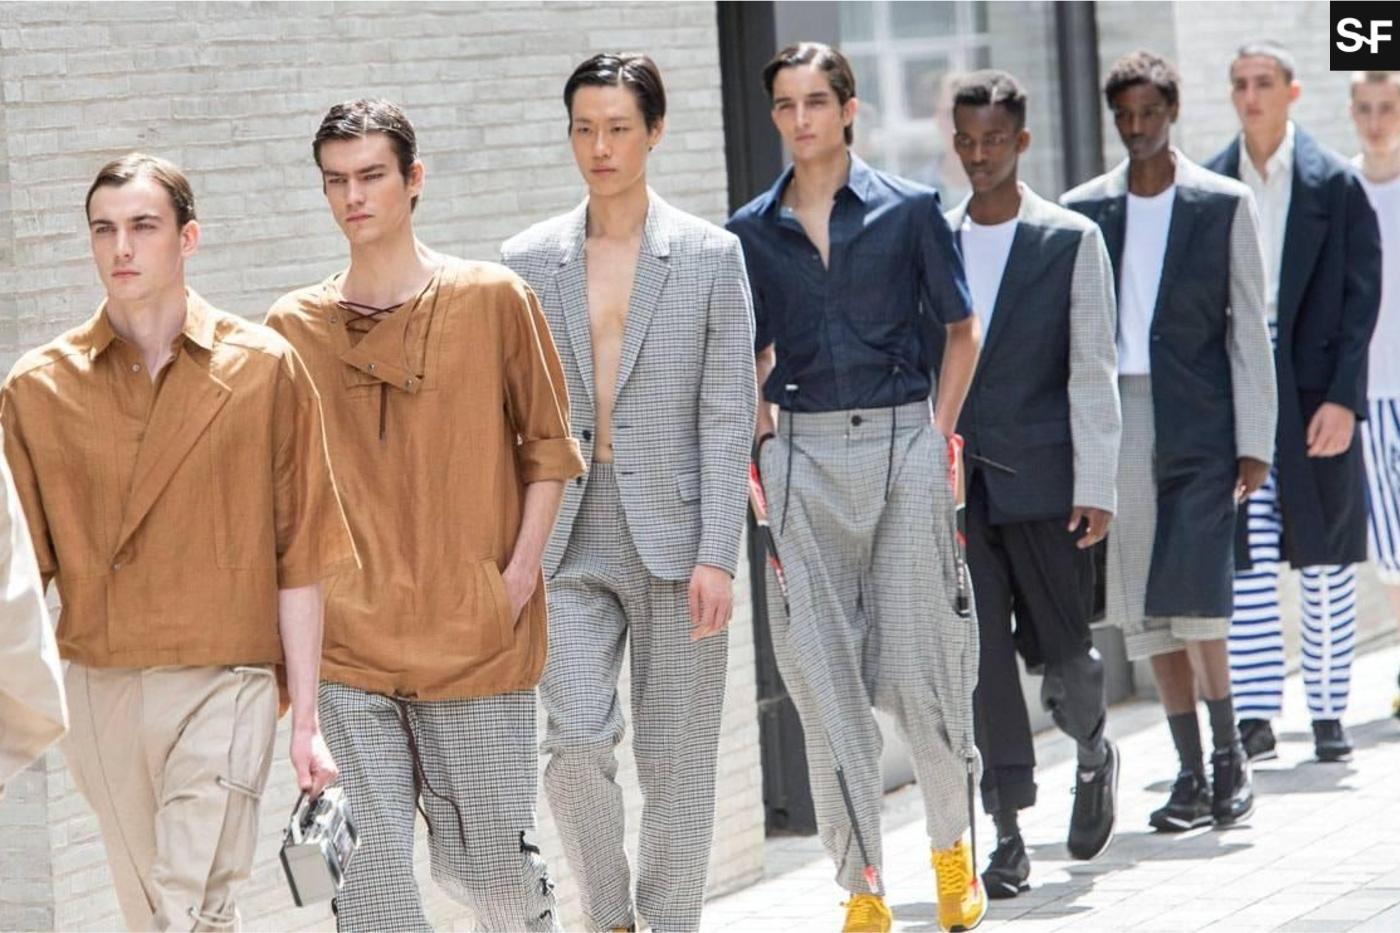 menswear-the-best-new-menswear-items-this-season